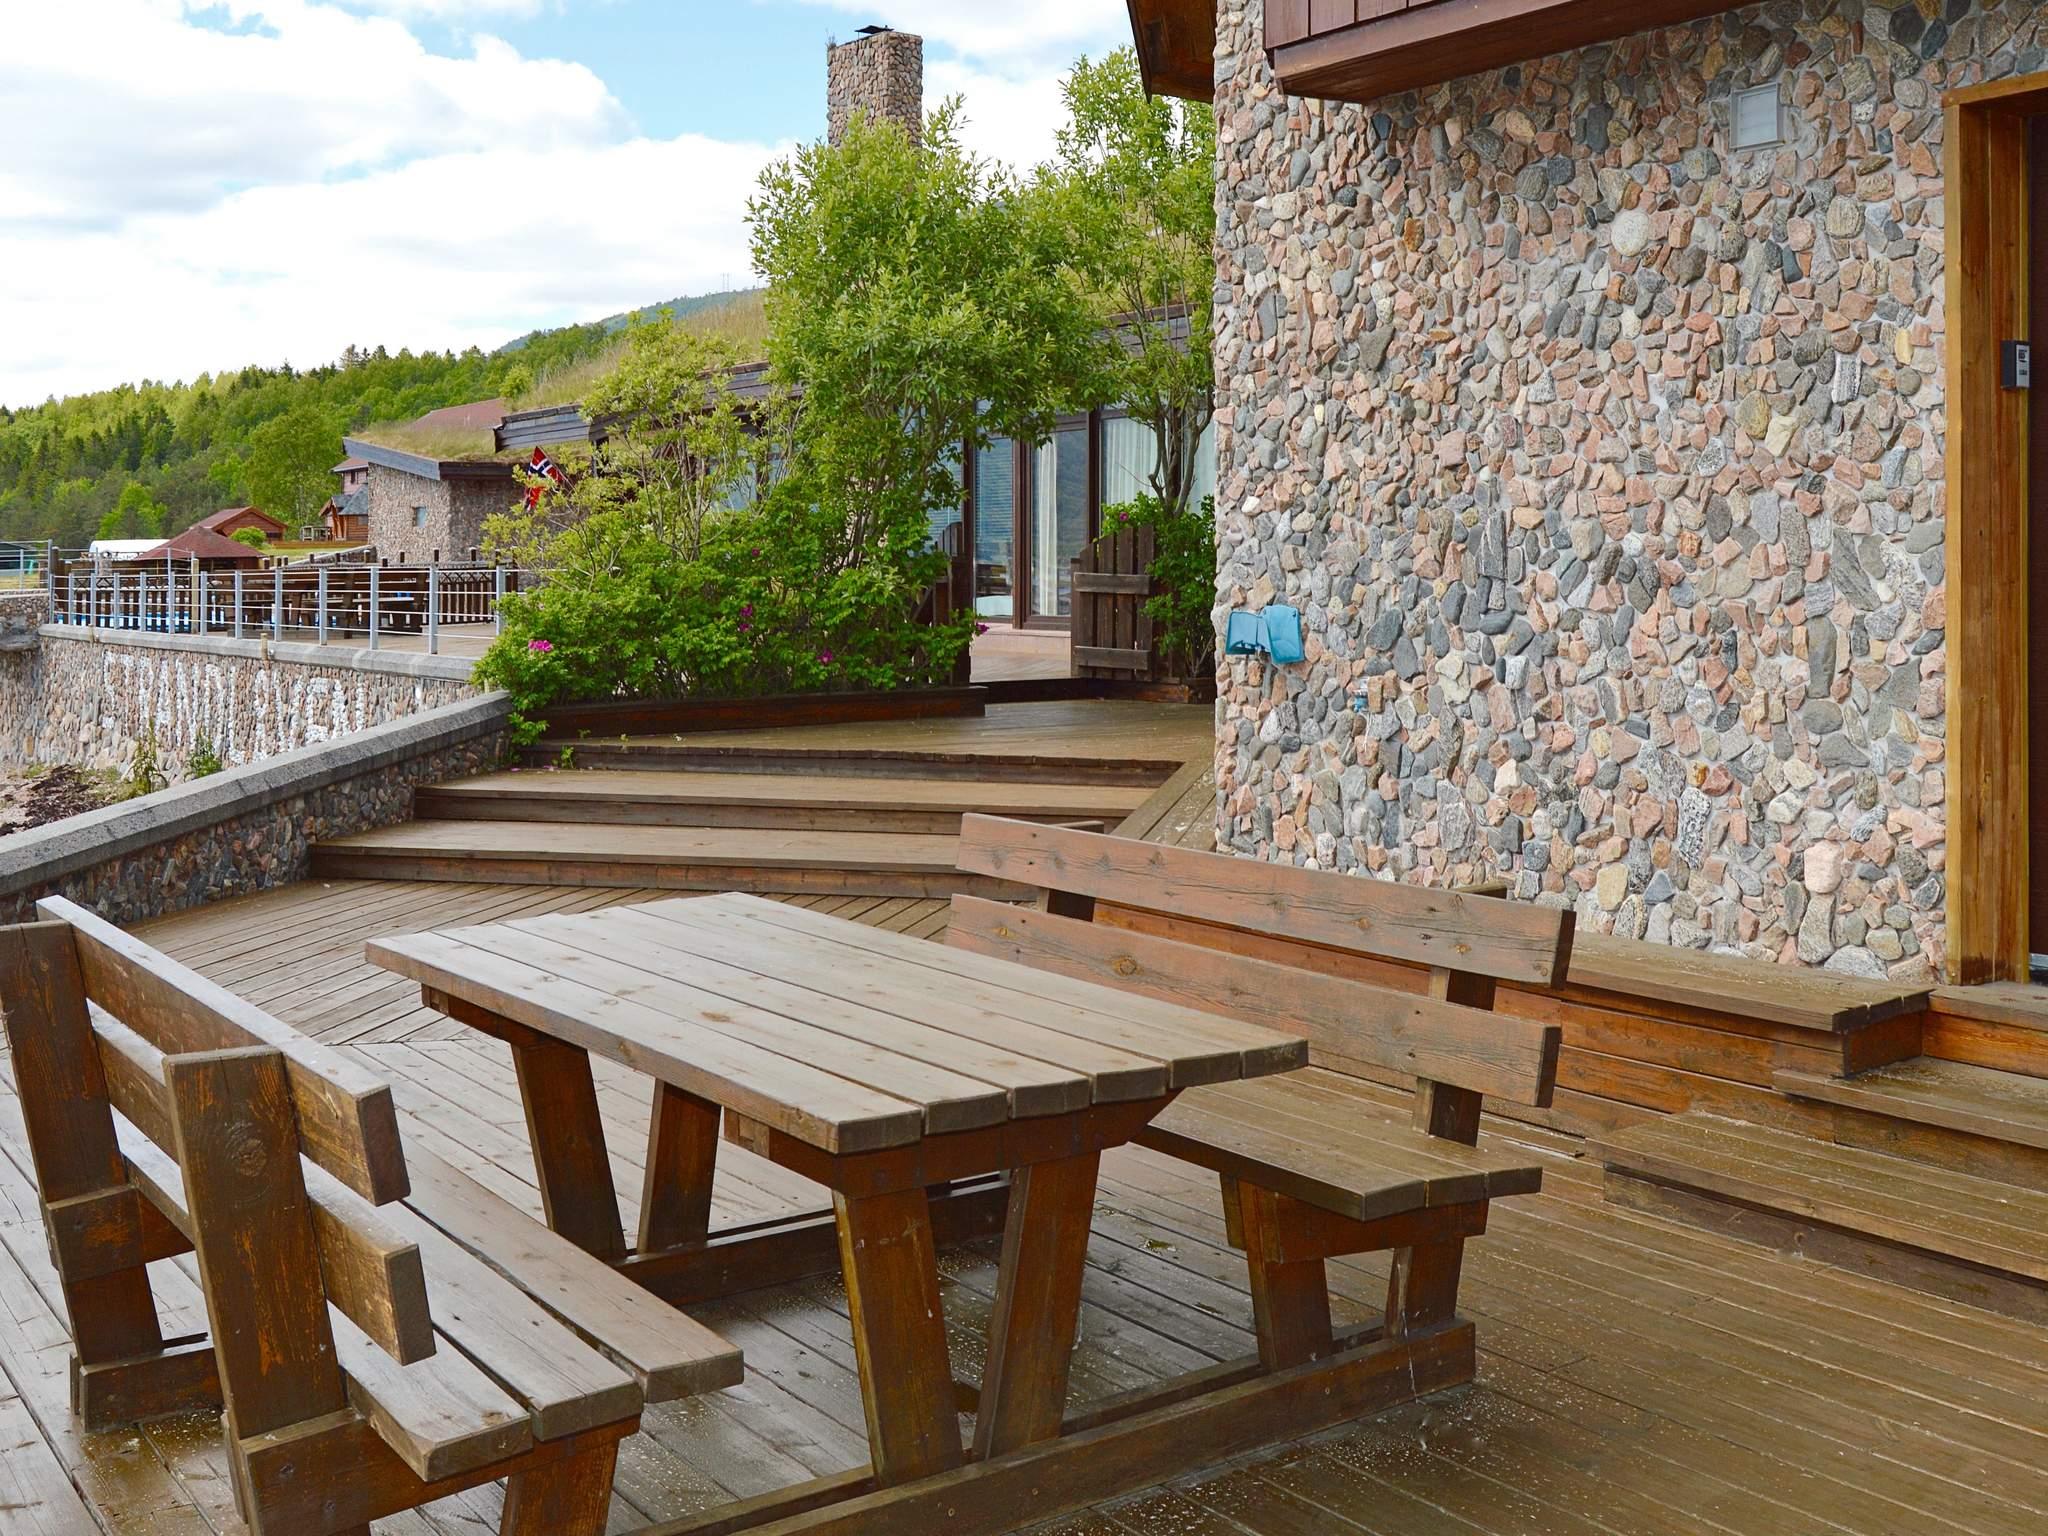 Ferienhaus Eidsvåg (84695), Eidsvåg, More - Romsdal, Westnorwegen, Norwegen, Bild 22